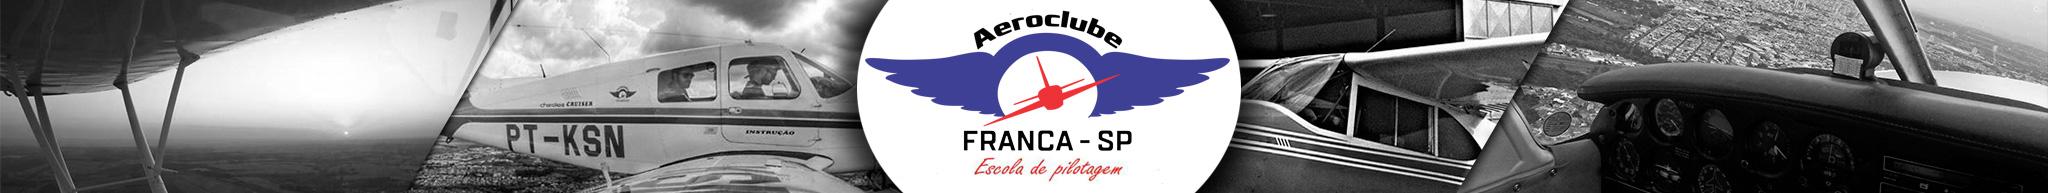 Aeroclube de Franca